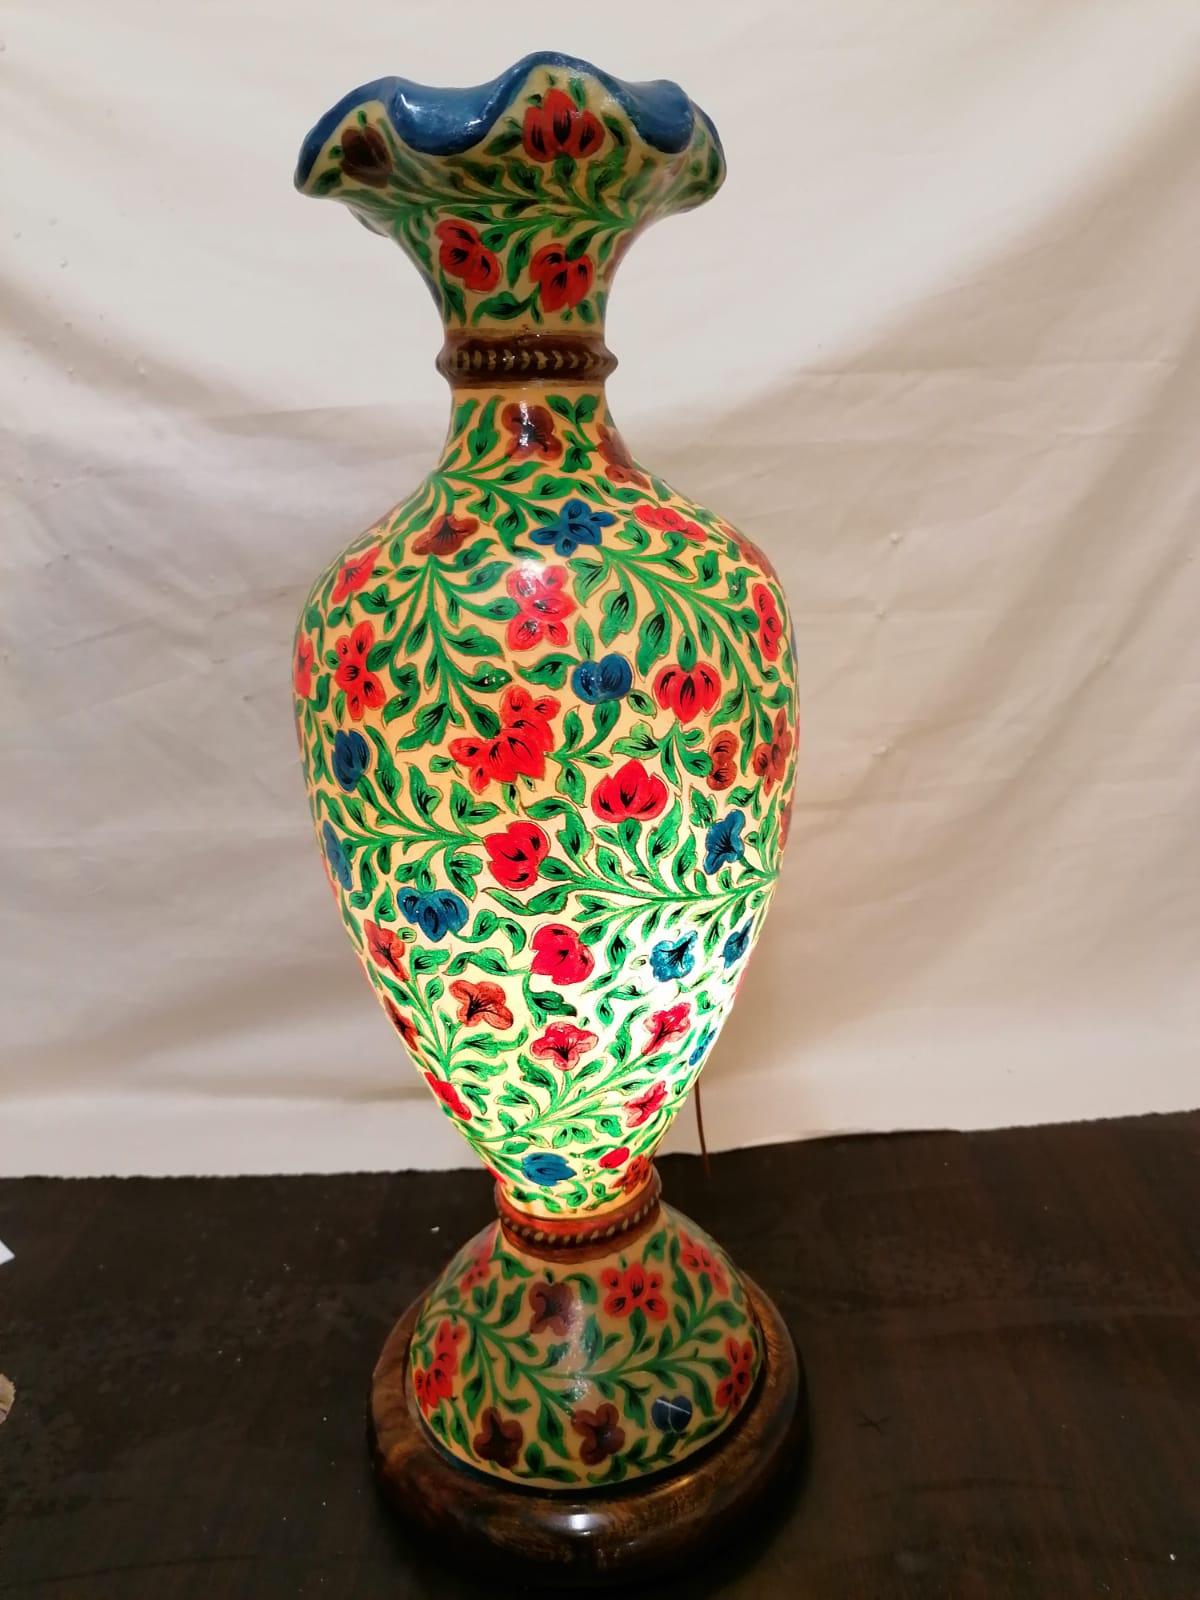 Vaso dipinto a mano, altezza 60cm